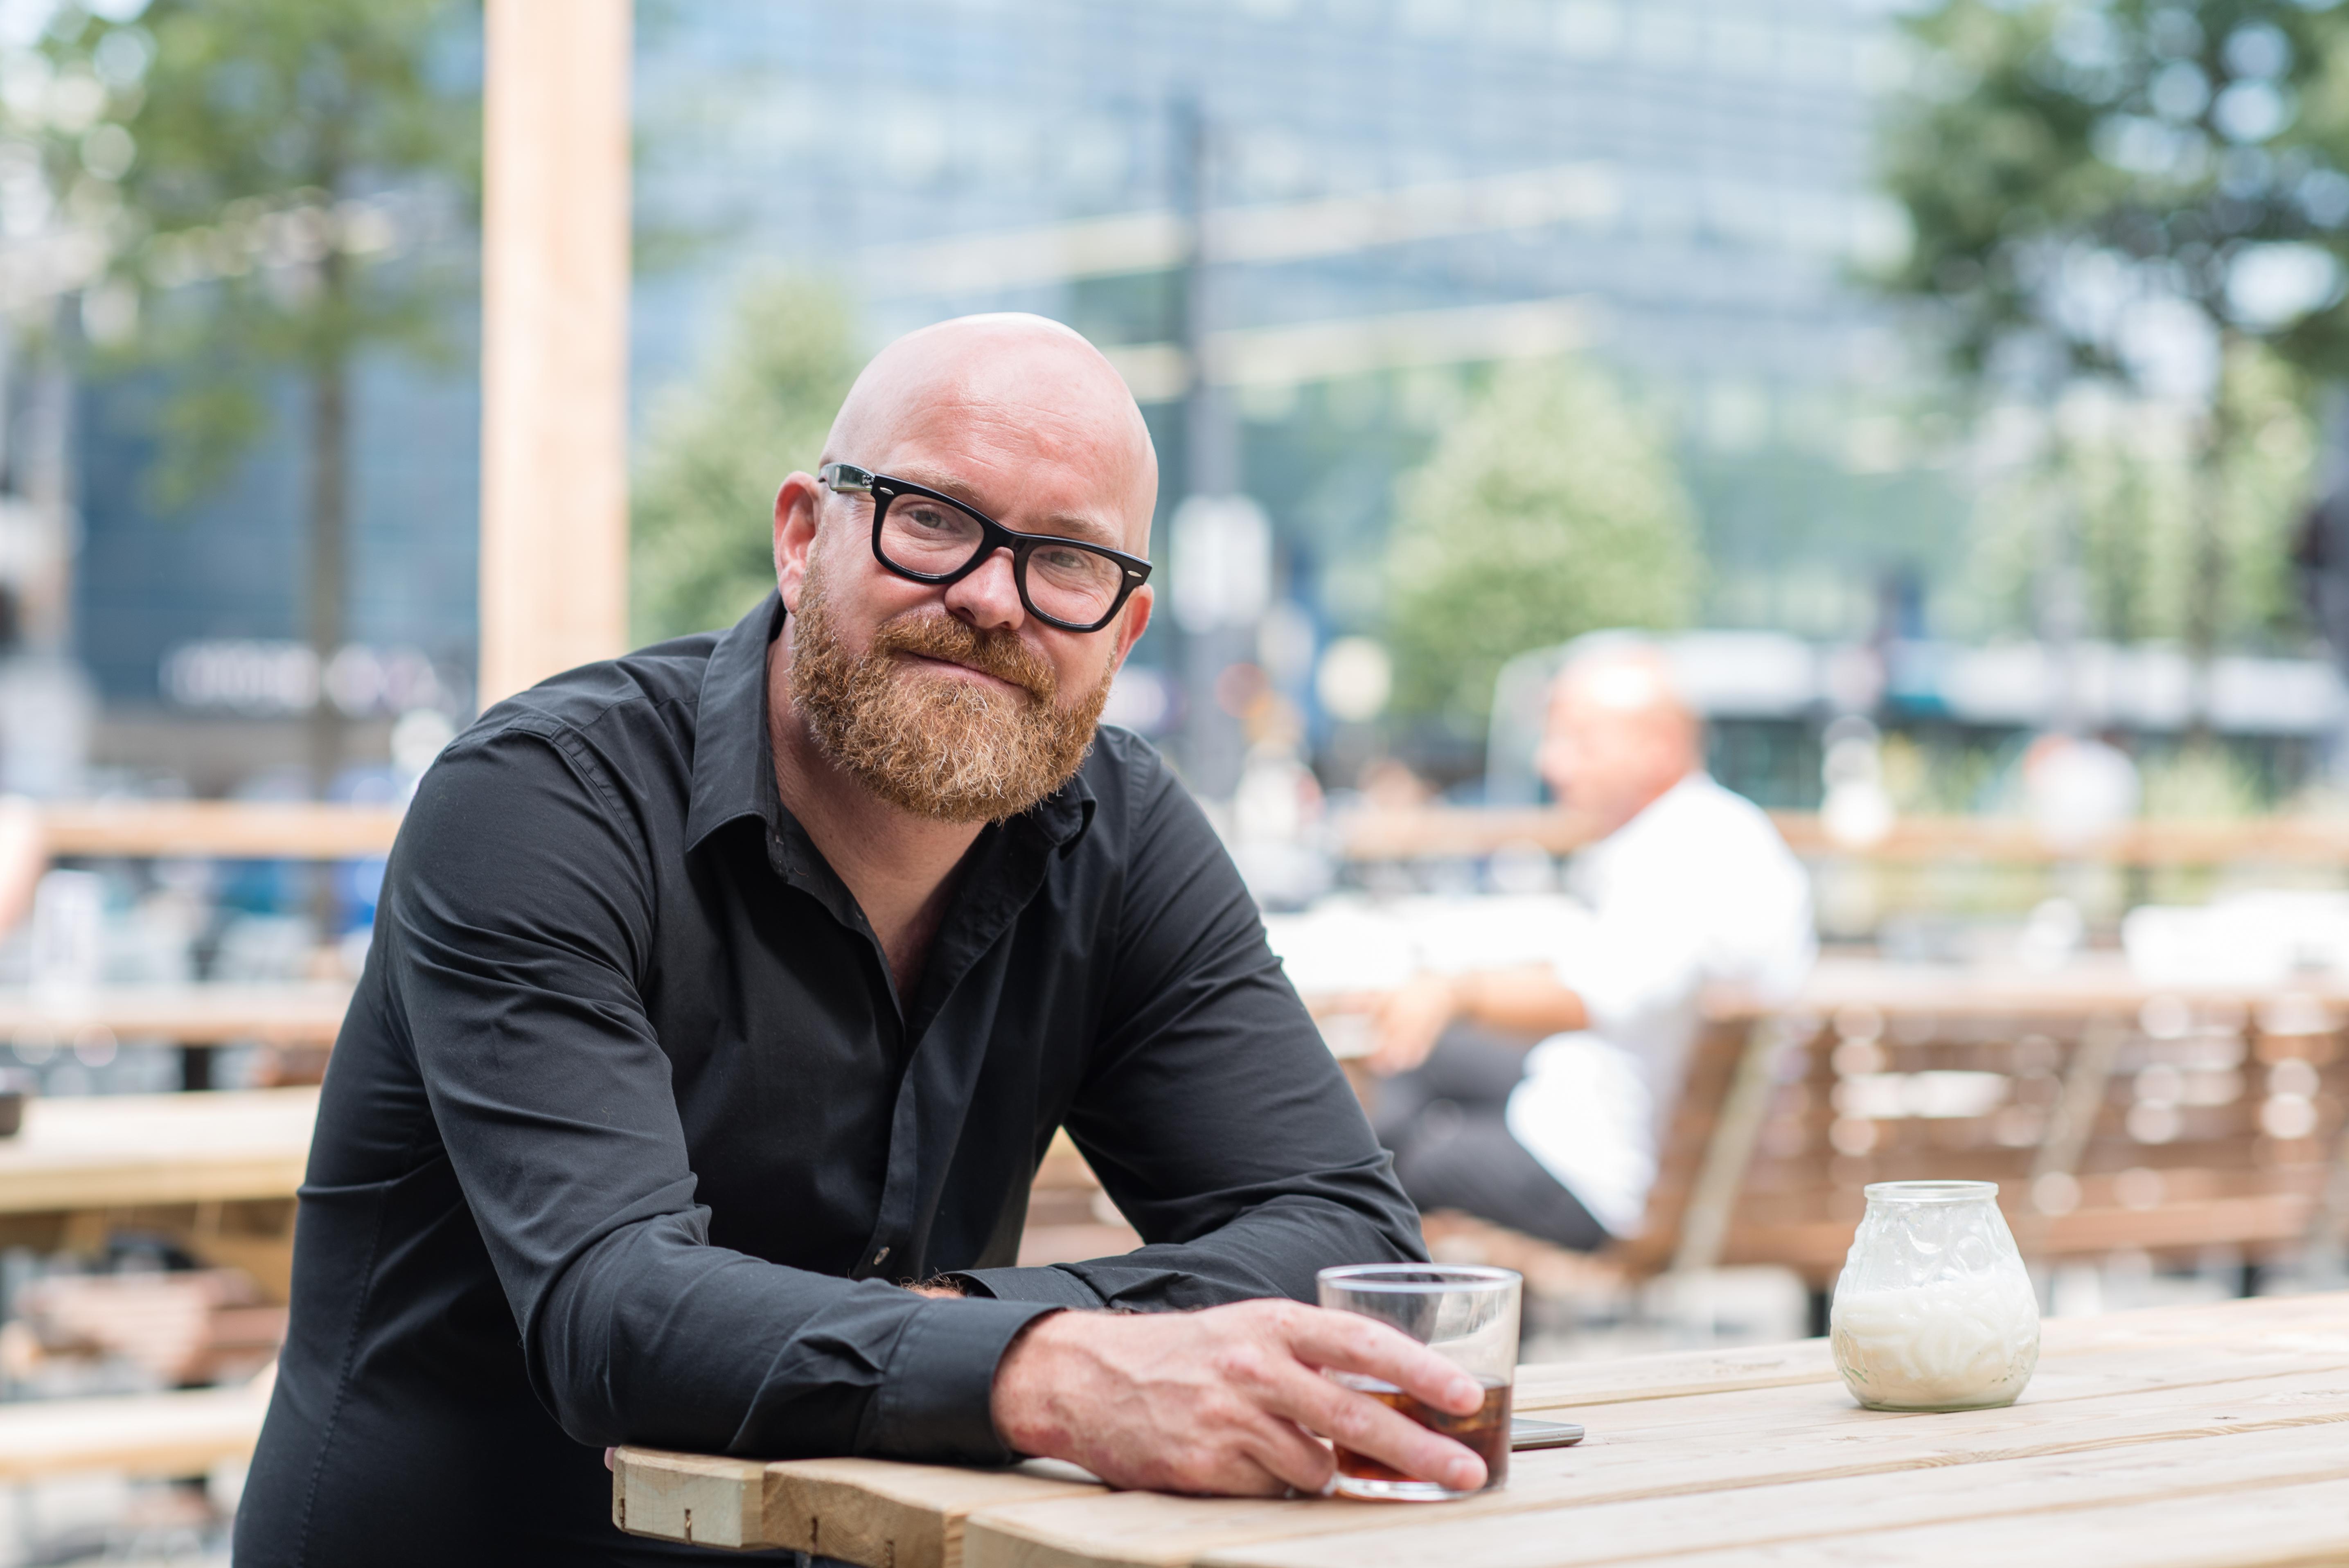 City-Tour-Rotterdam-ByMikTours-Mik-Hartman